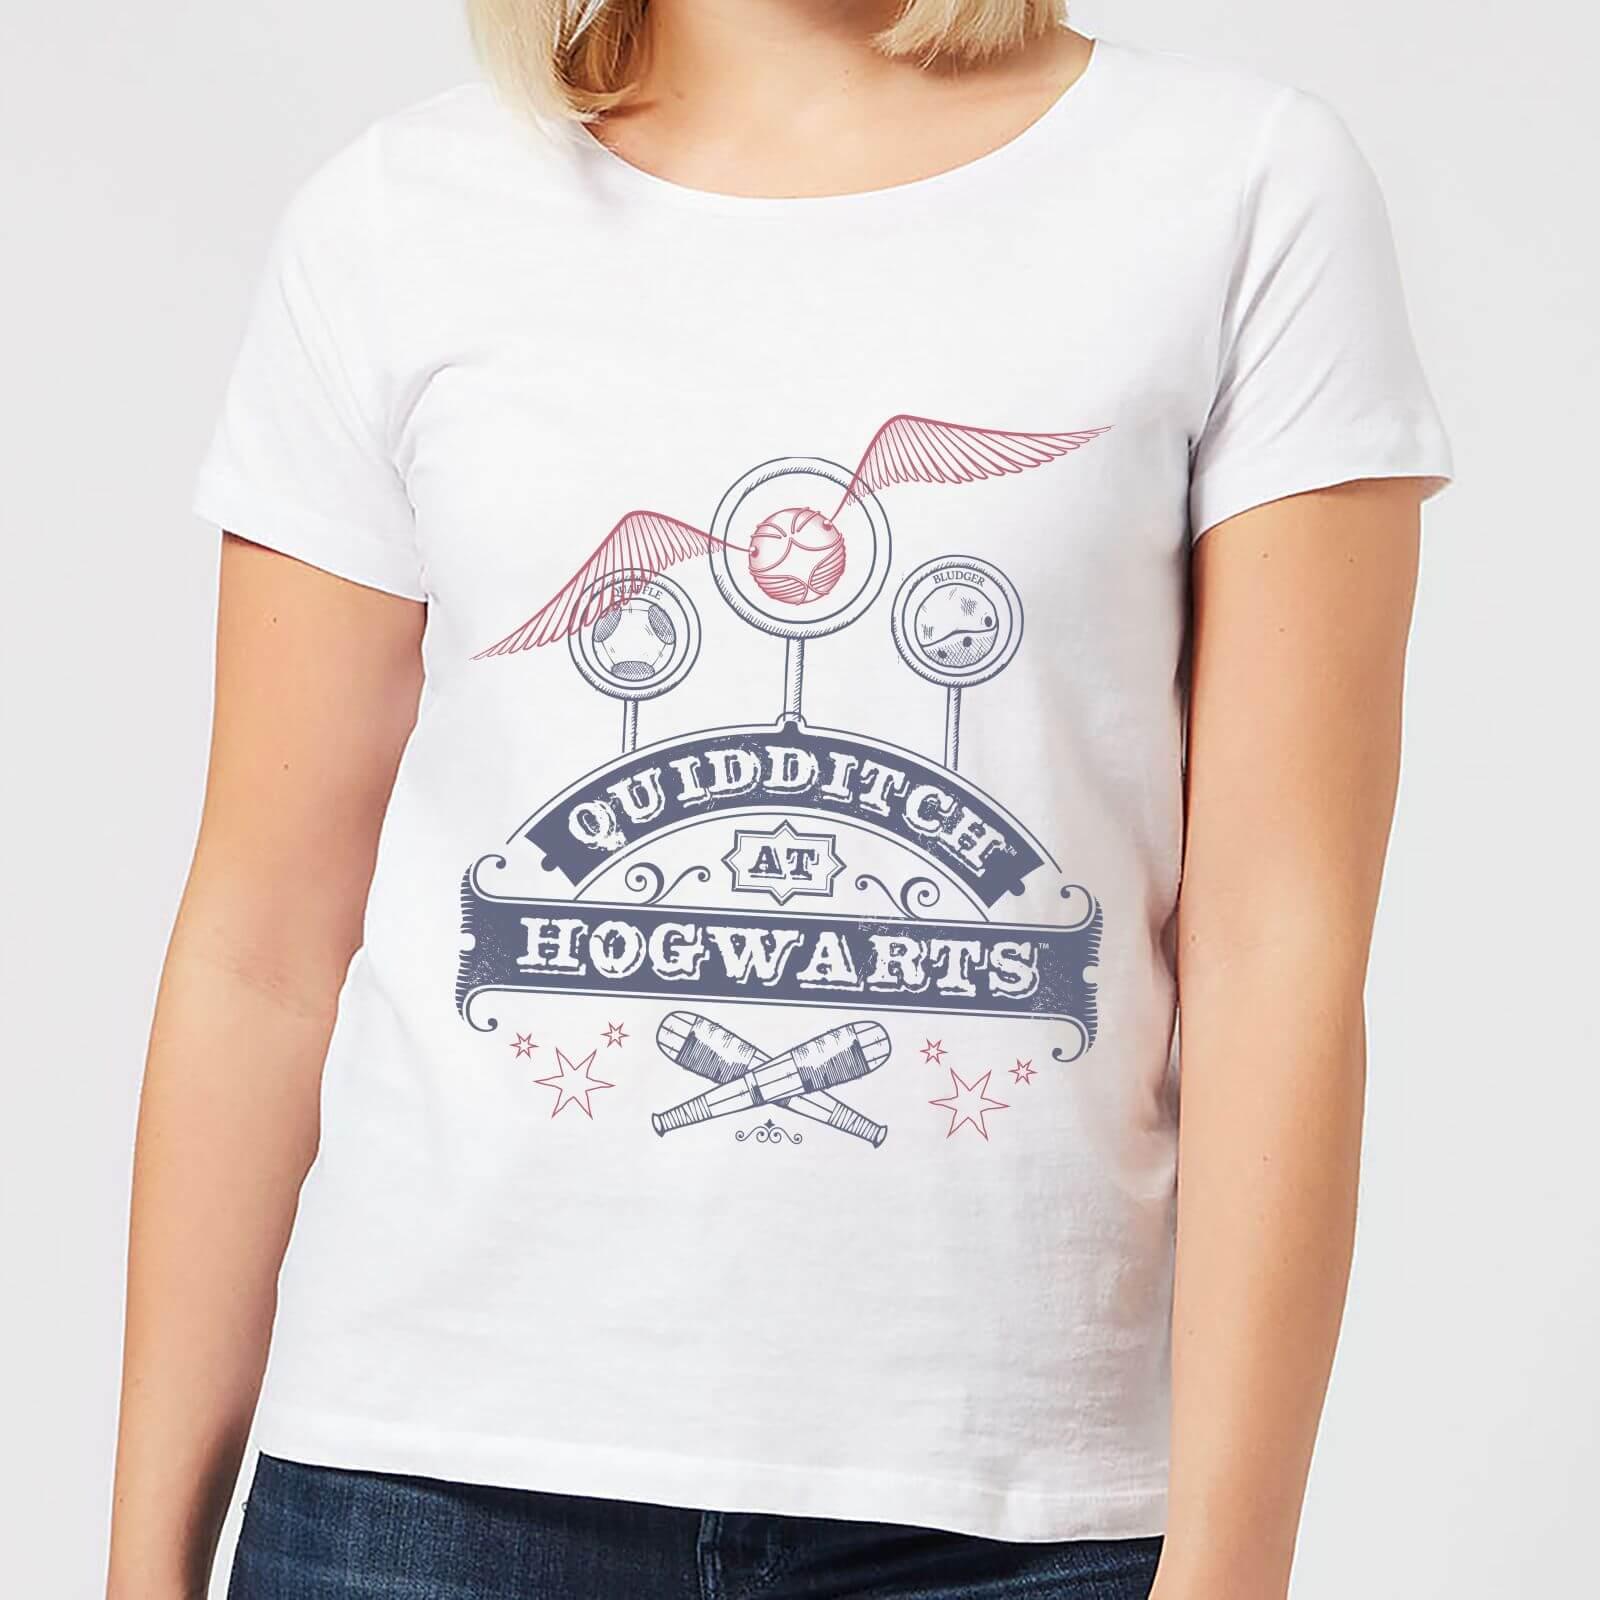 Harry Potter Quidditch At Hogwarts Women's T-Shirt - White - 5XL - White